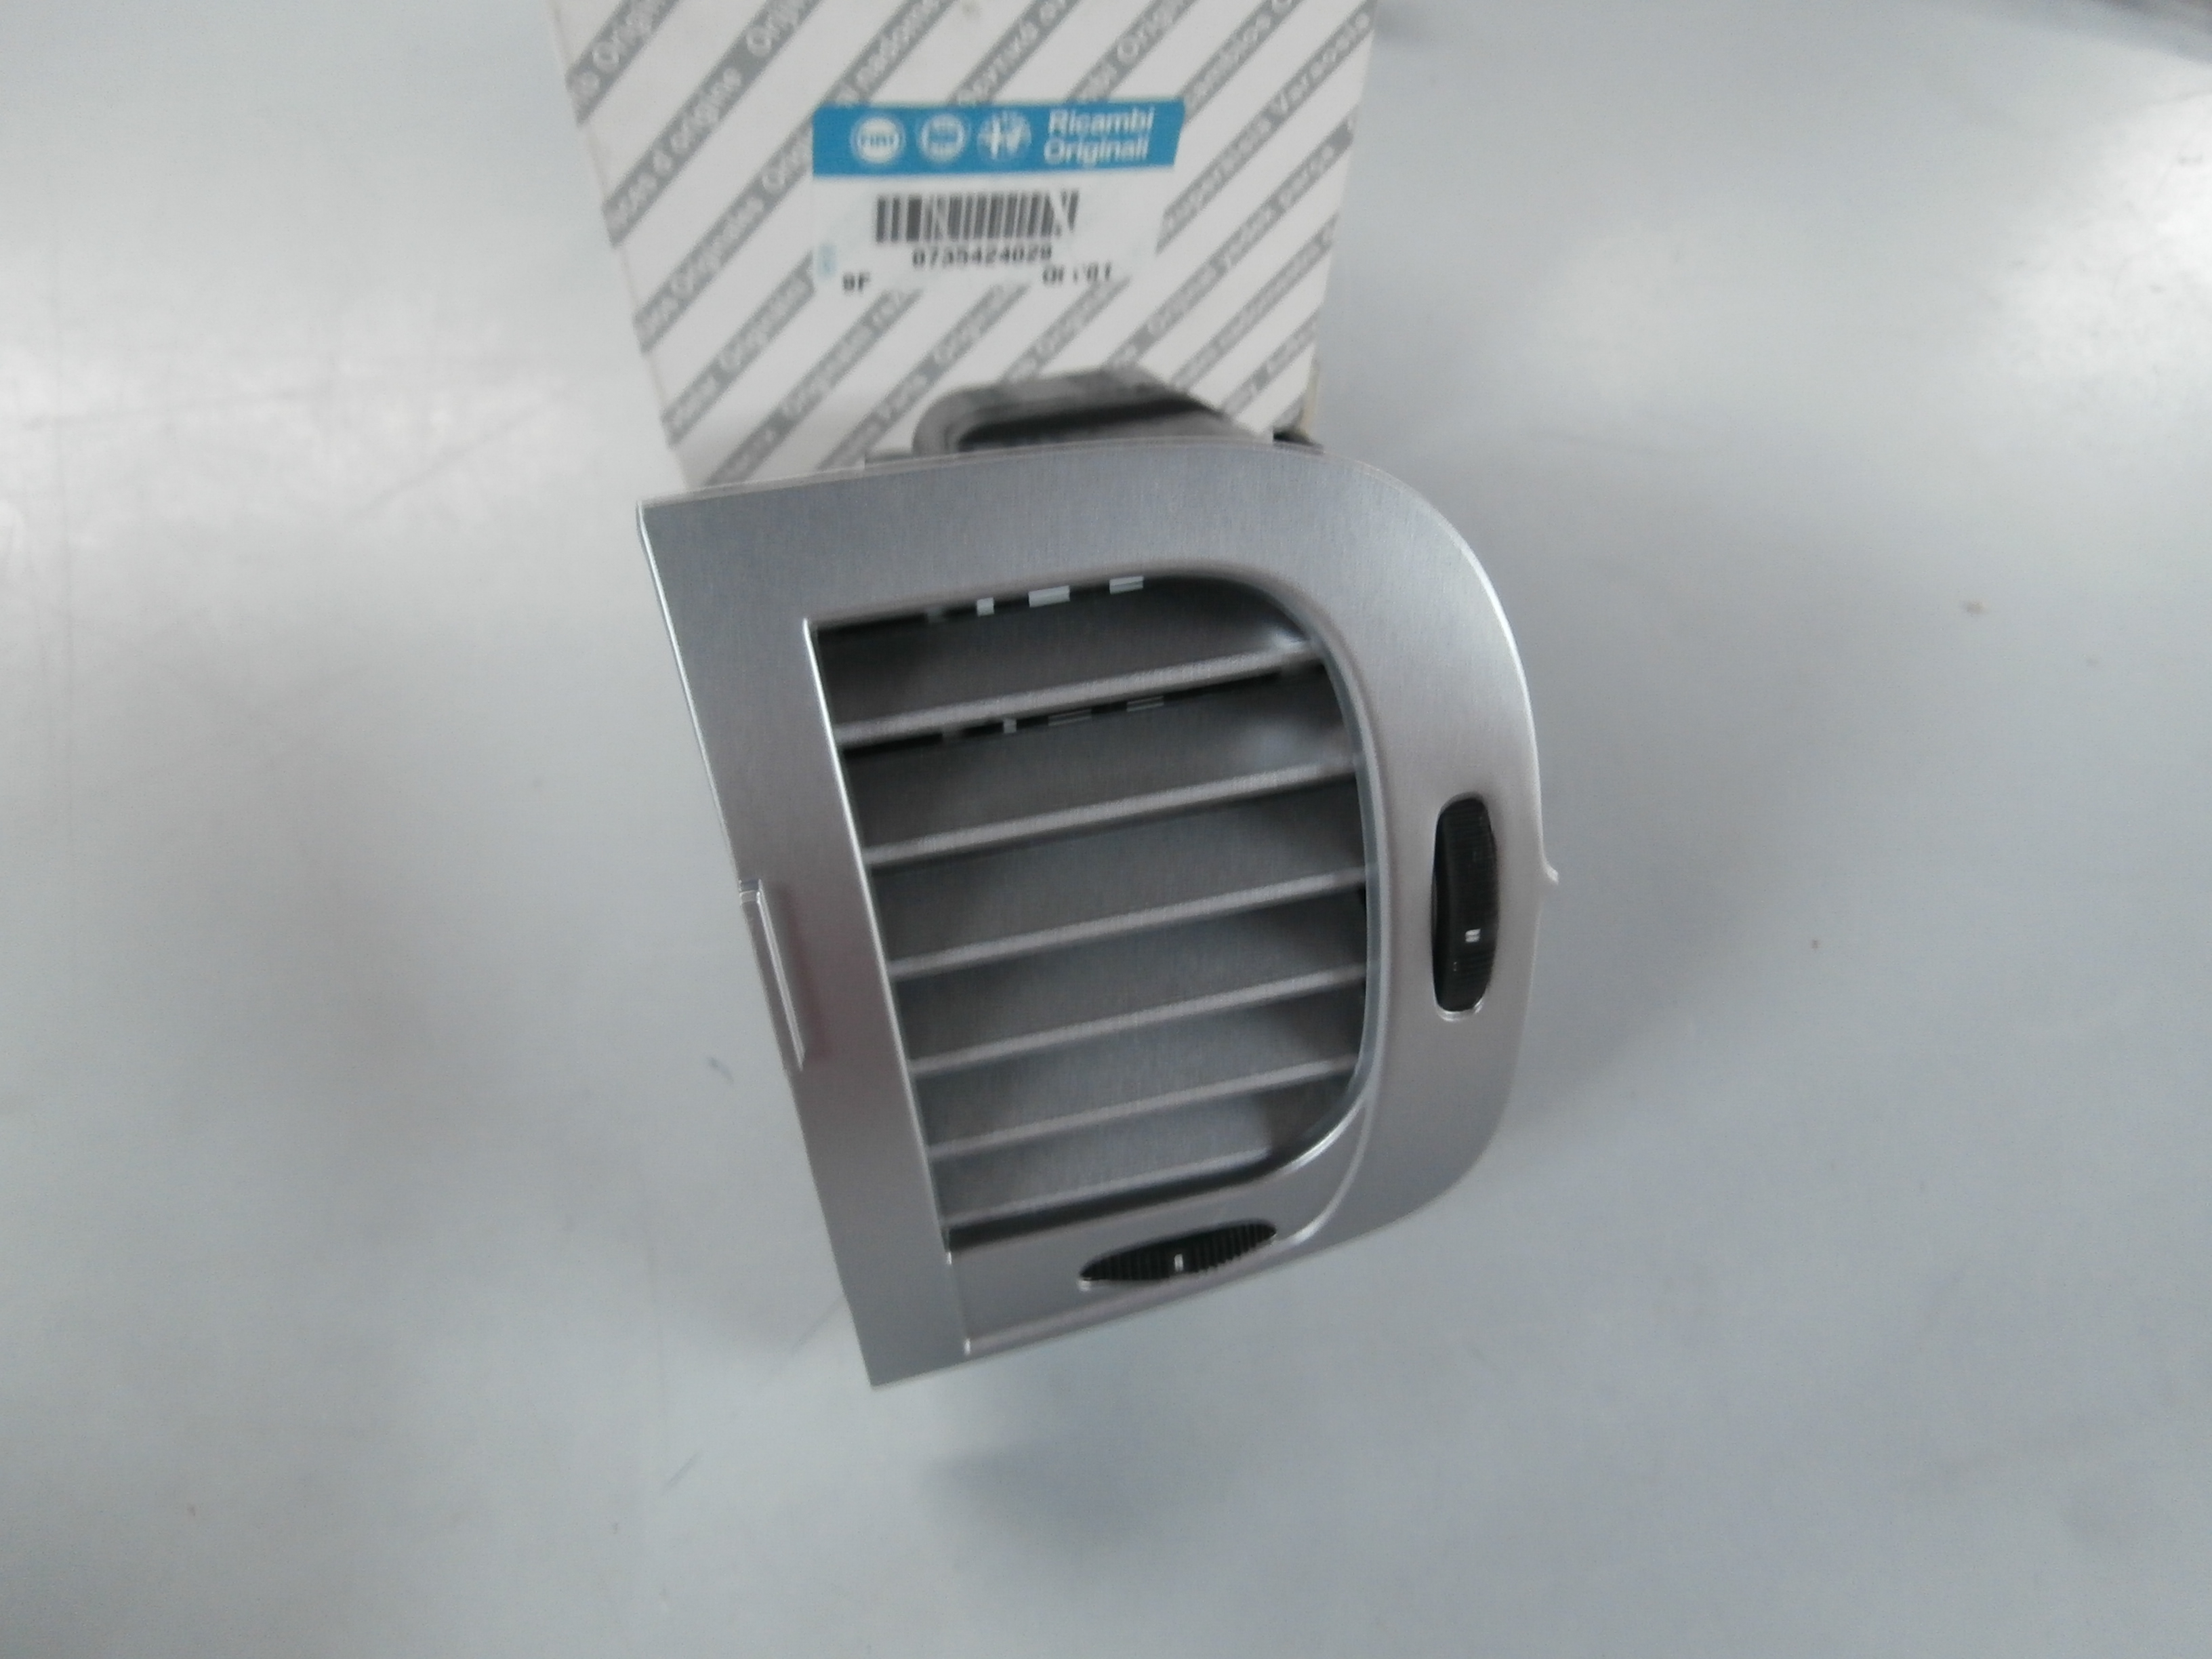 735424029 right central air diffuser lancia ypsilon ebay. Black Bedroom Furniture Sets. Home Design Ideas